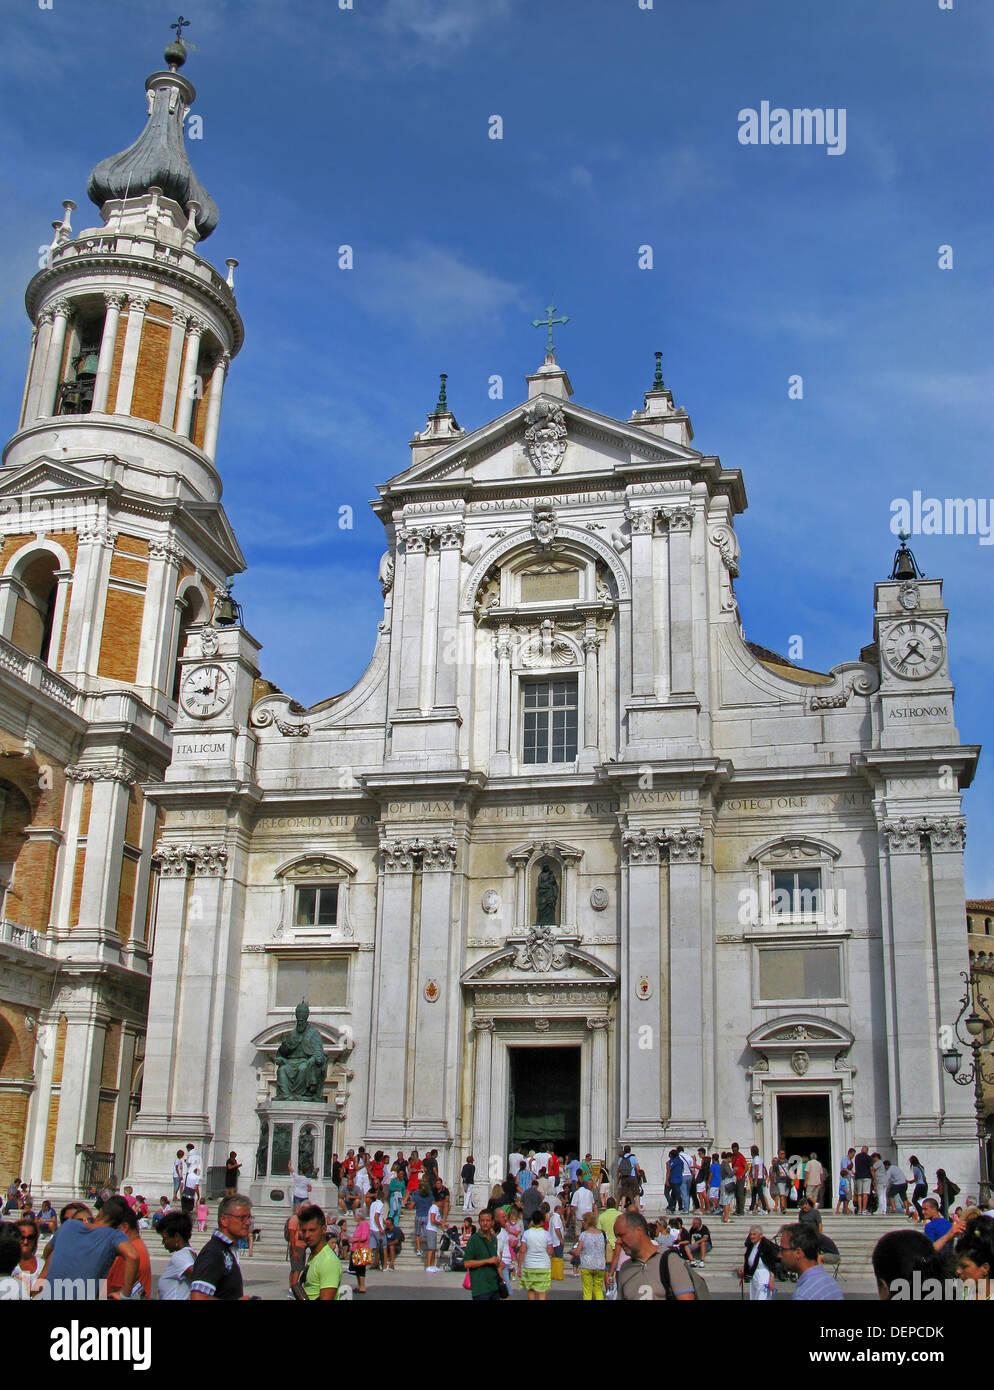 Loreto.The Shrine of the Holy House or basilica of the Santa Casa. - Stock Image